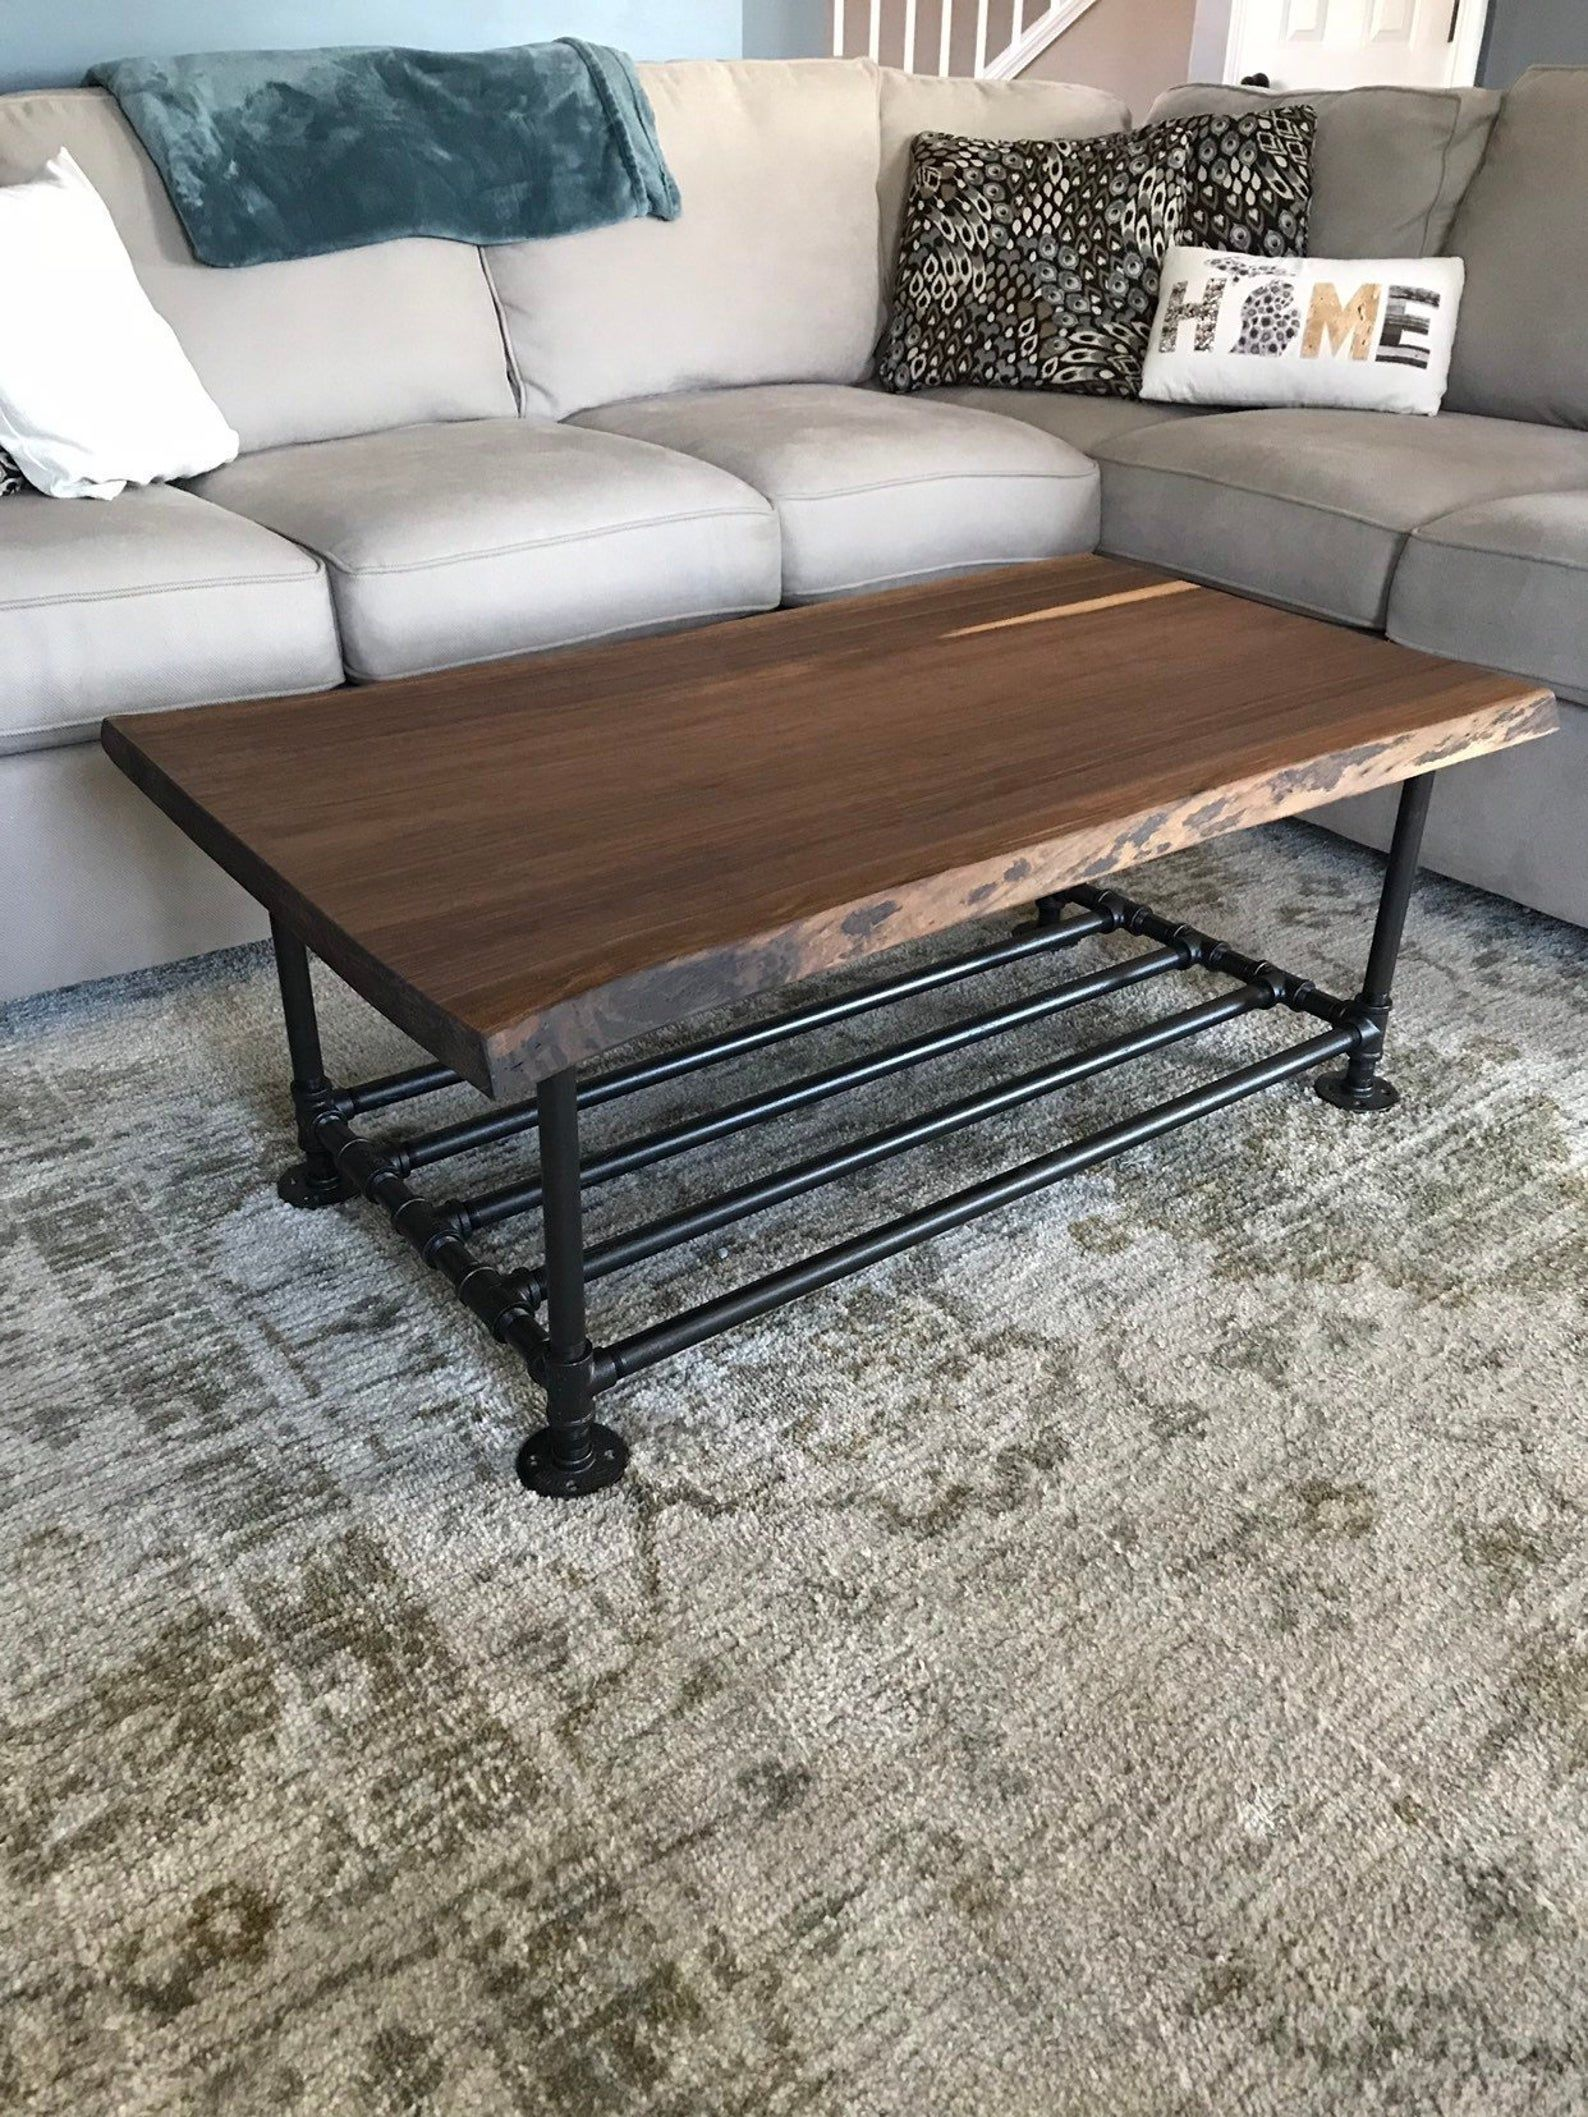 Live Edge Walnut Coffee Table Etsy Coffee Table Walnut Coffee Table Table [ 2117 x 1588 Pixel ]